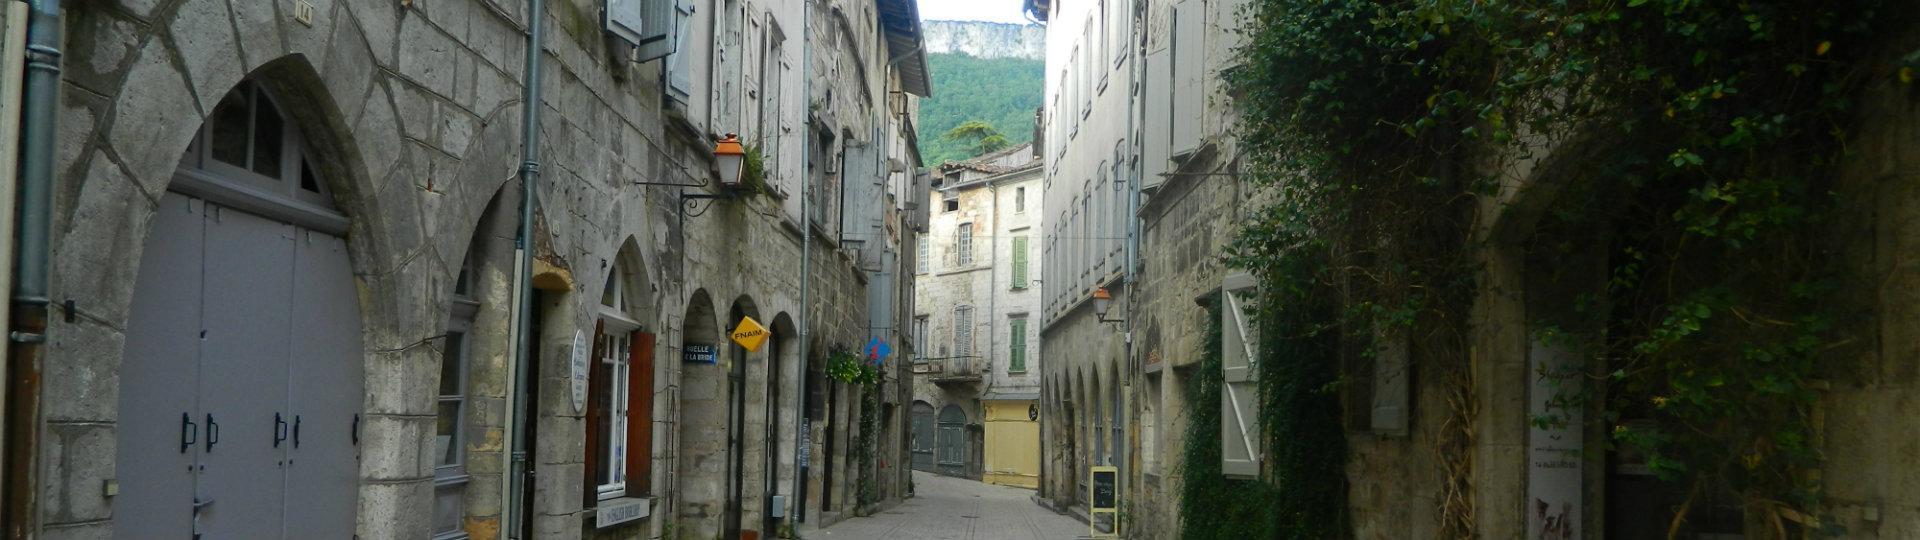 rue-de-la-pelisserie-3